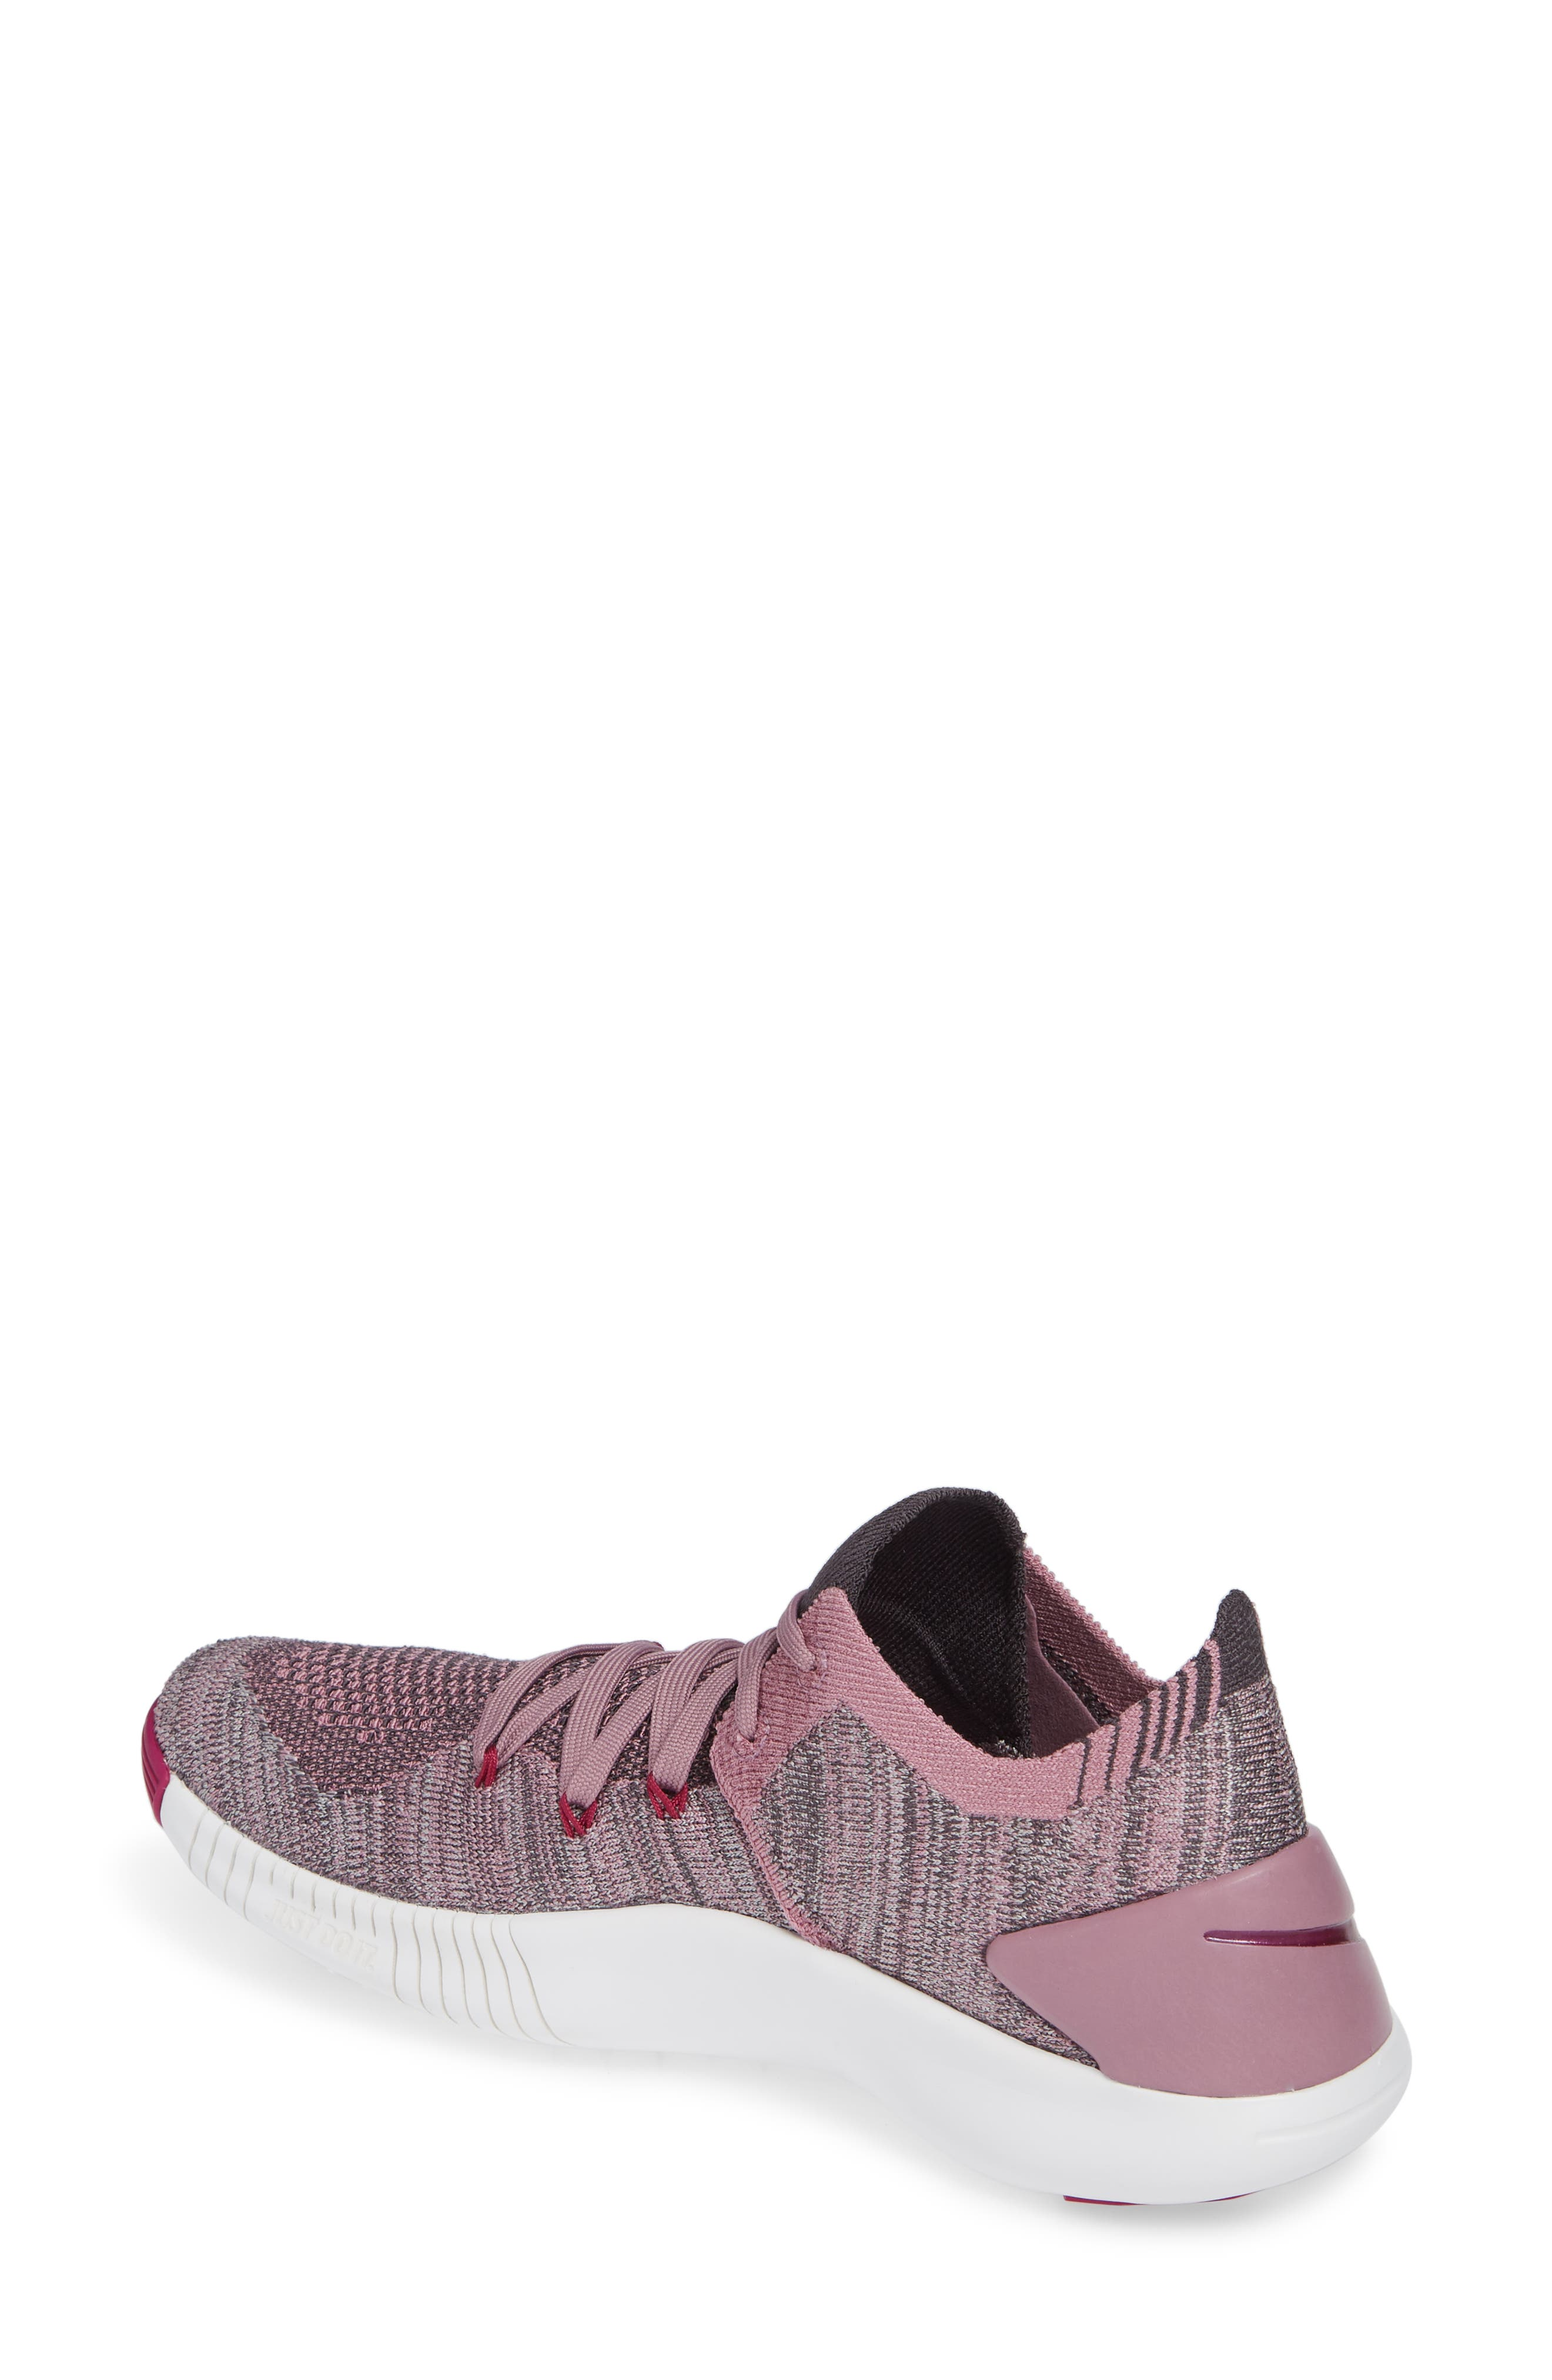 ,                             Free TR Flyknit 3 Training Shoe,                             Alternate thumbnail 61, color,                             251